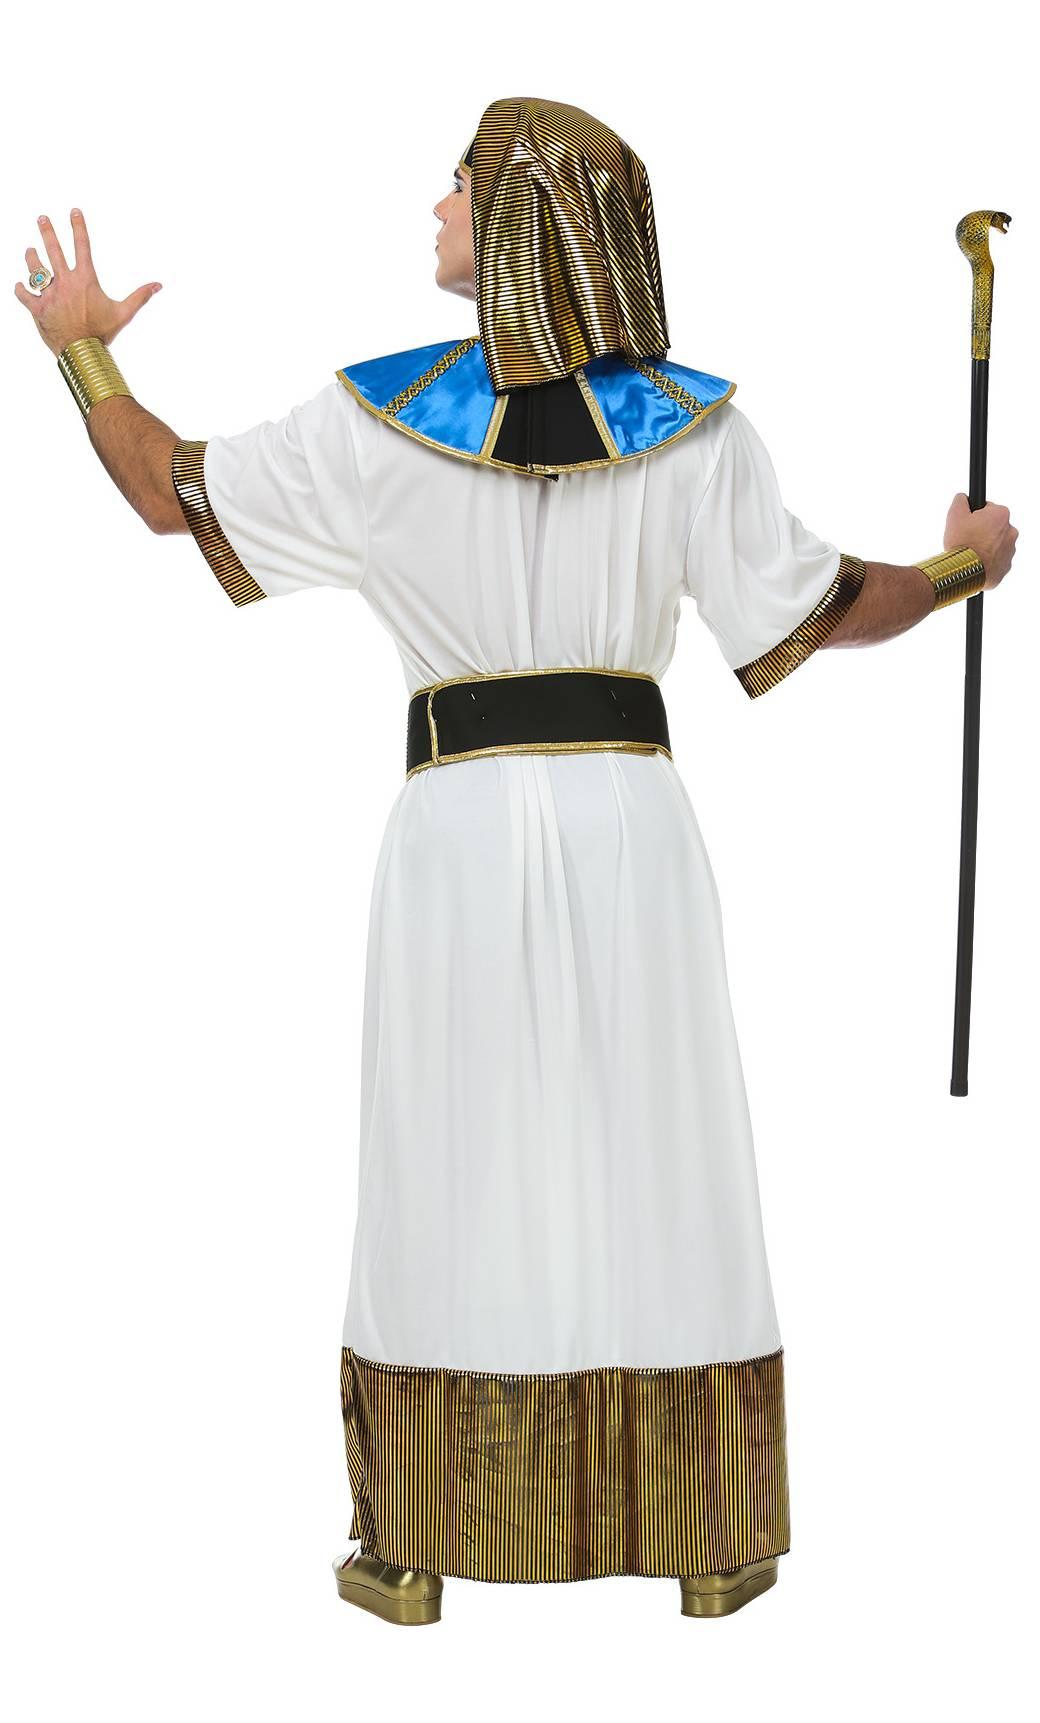 Costume-Pharaon-égyptien-2